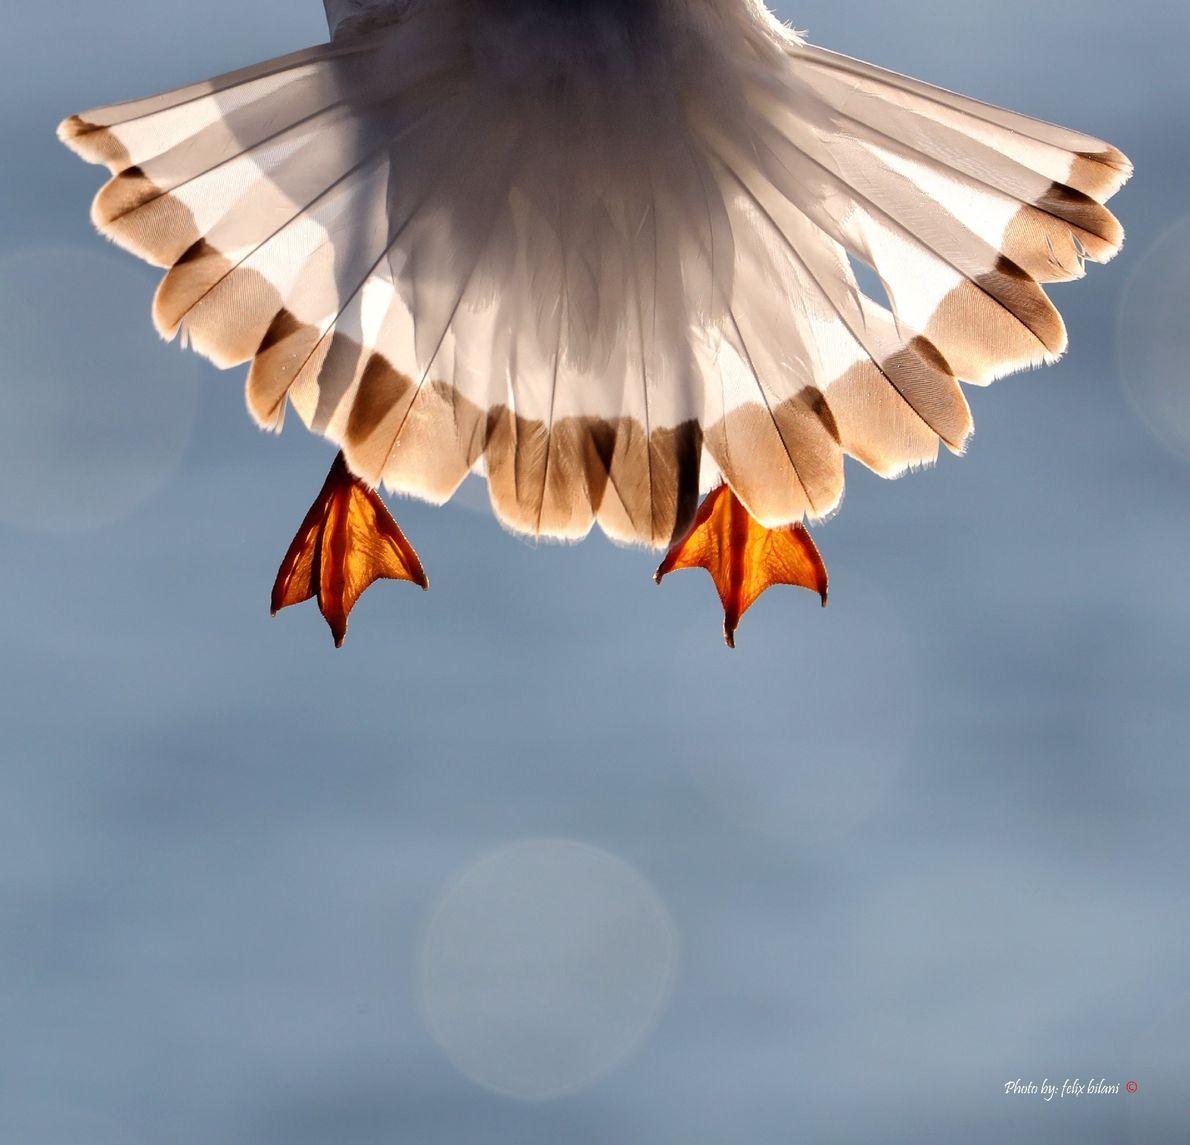 Your Shot photographer Felix Bilani captured this unique view of a bird as it takes flight.